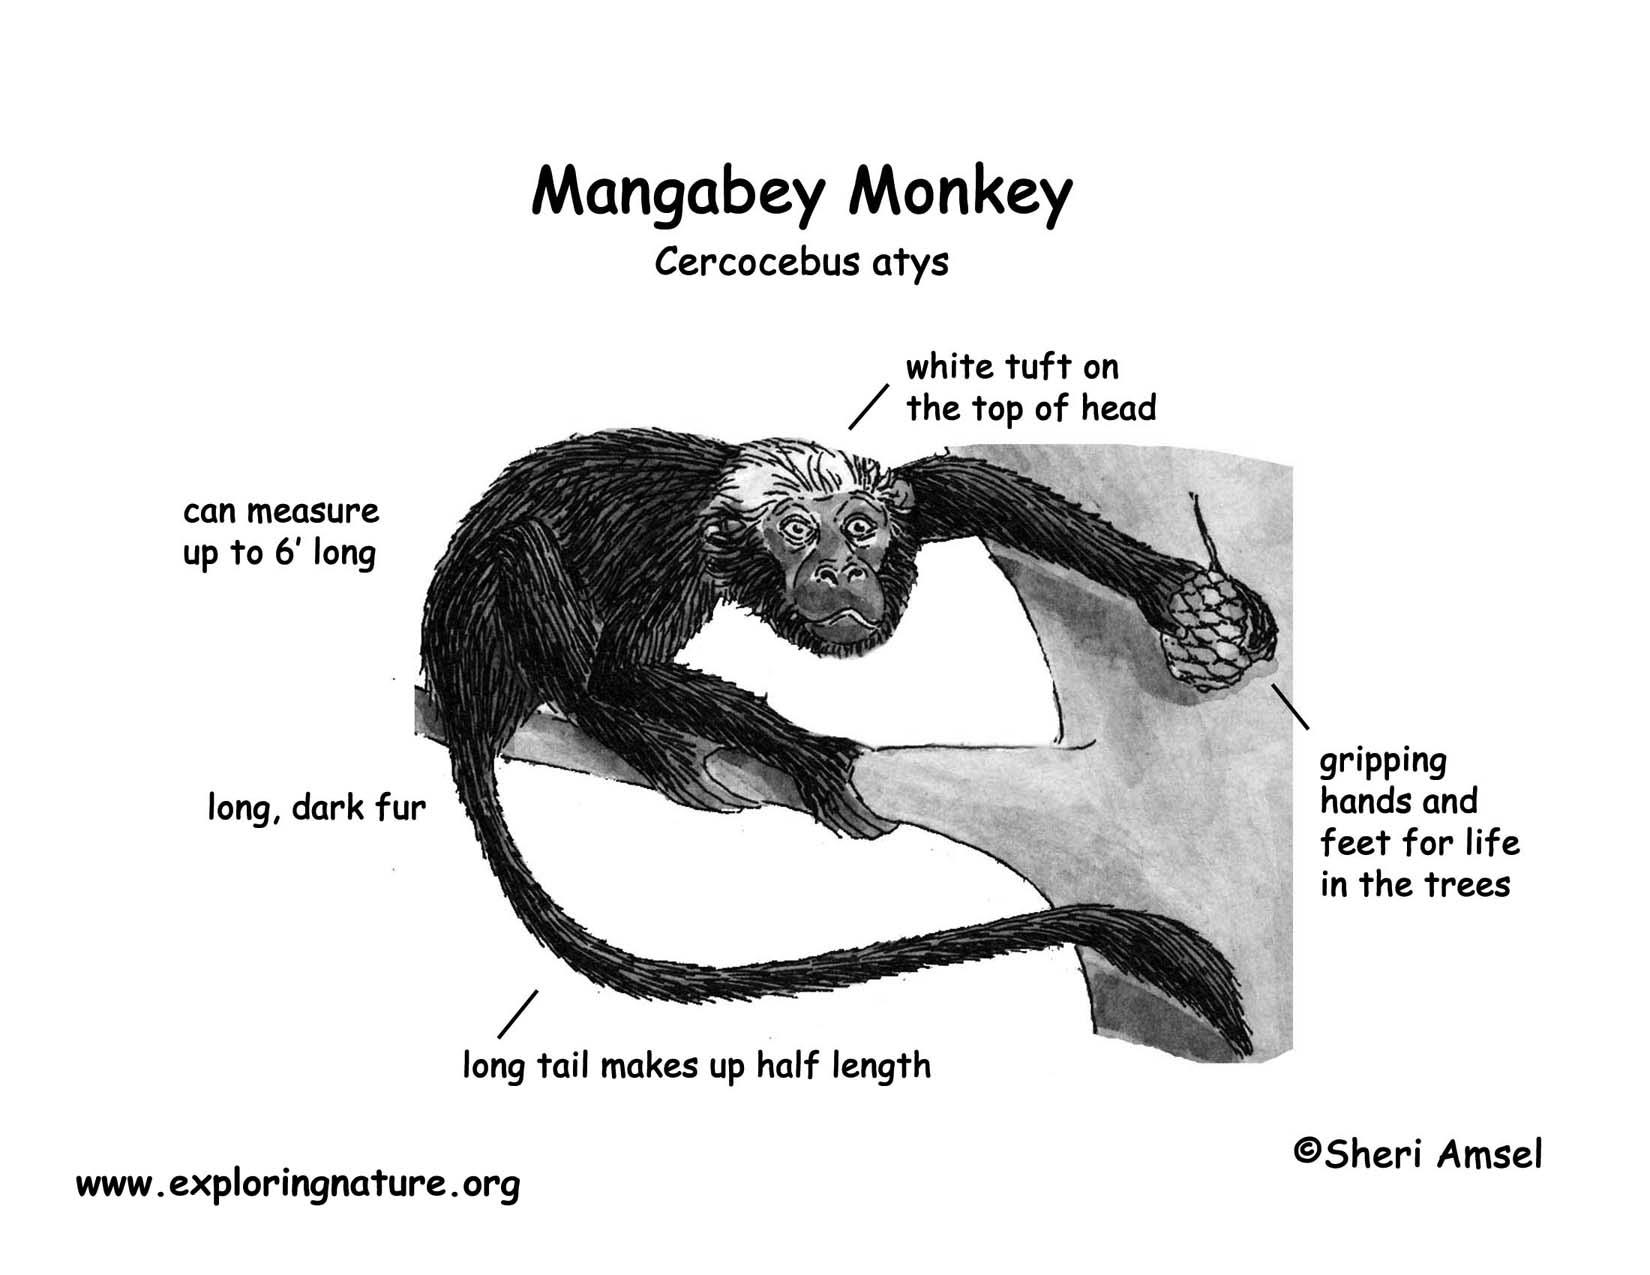 monkey mangabey rh exploringnature org diagram of a monkey wrench diagram of a squirrel monkey